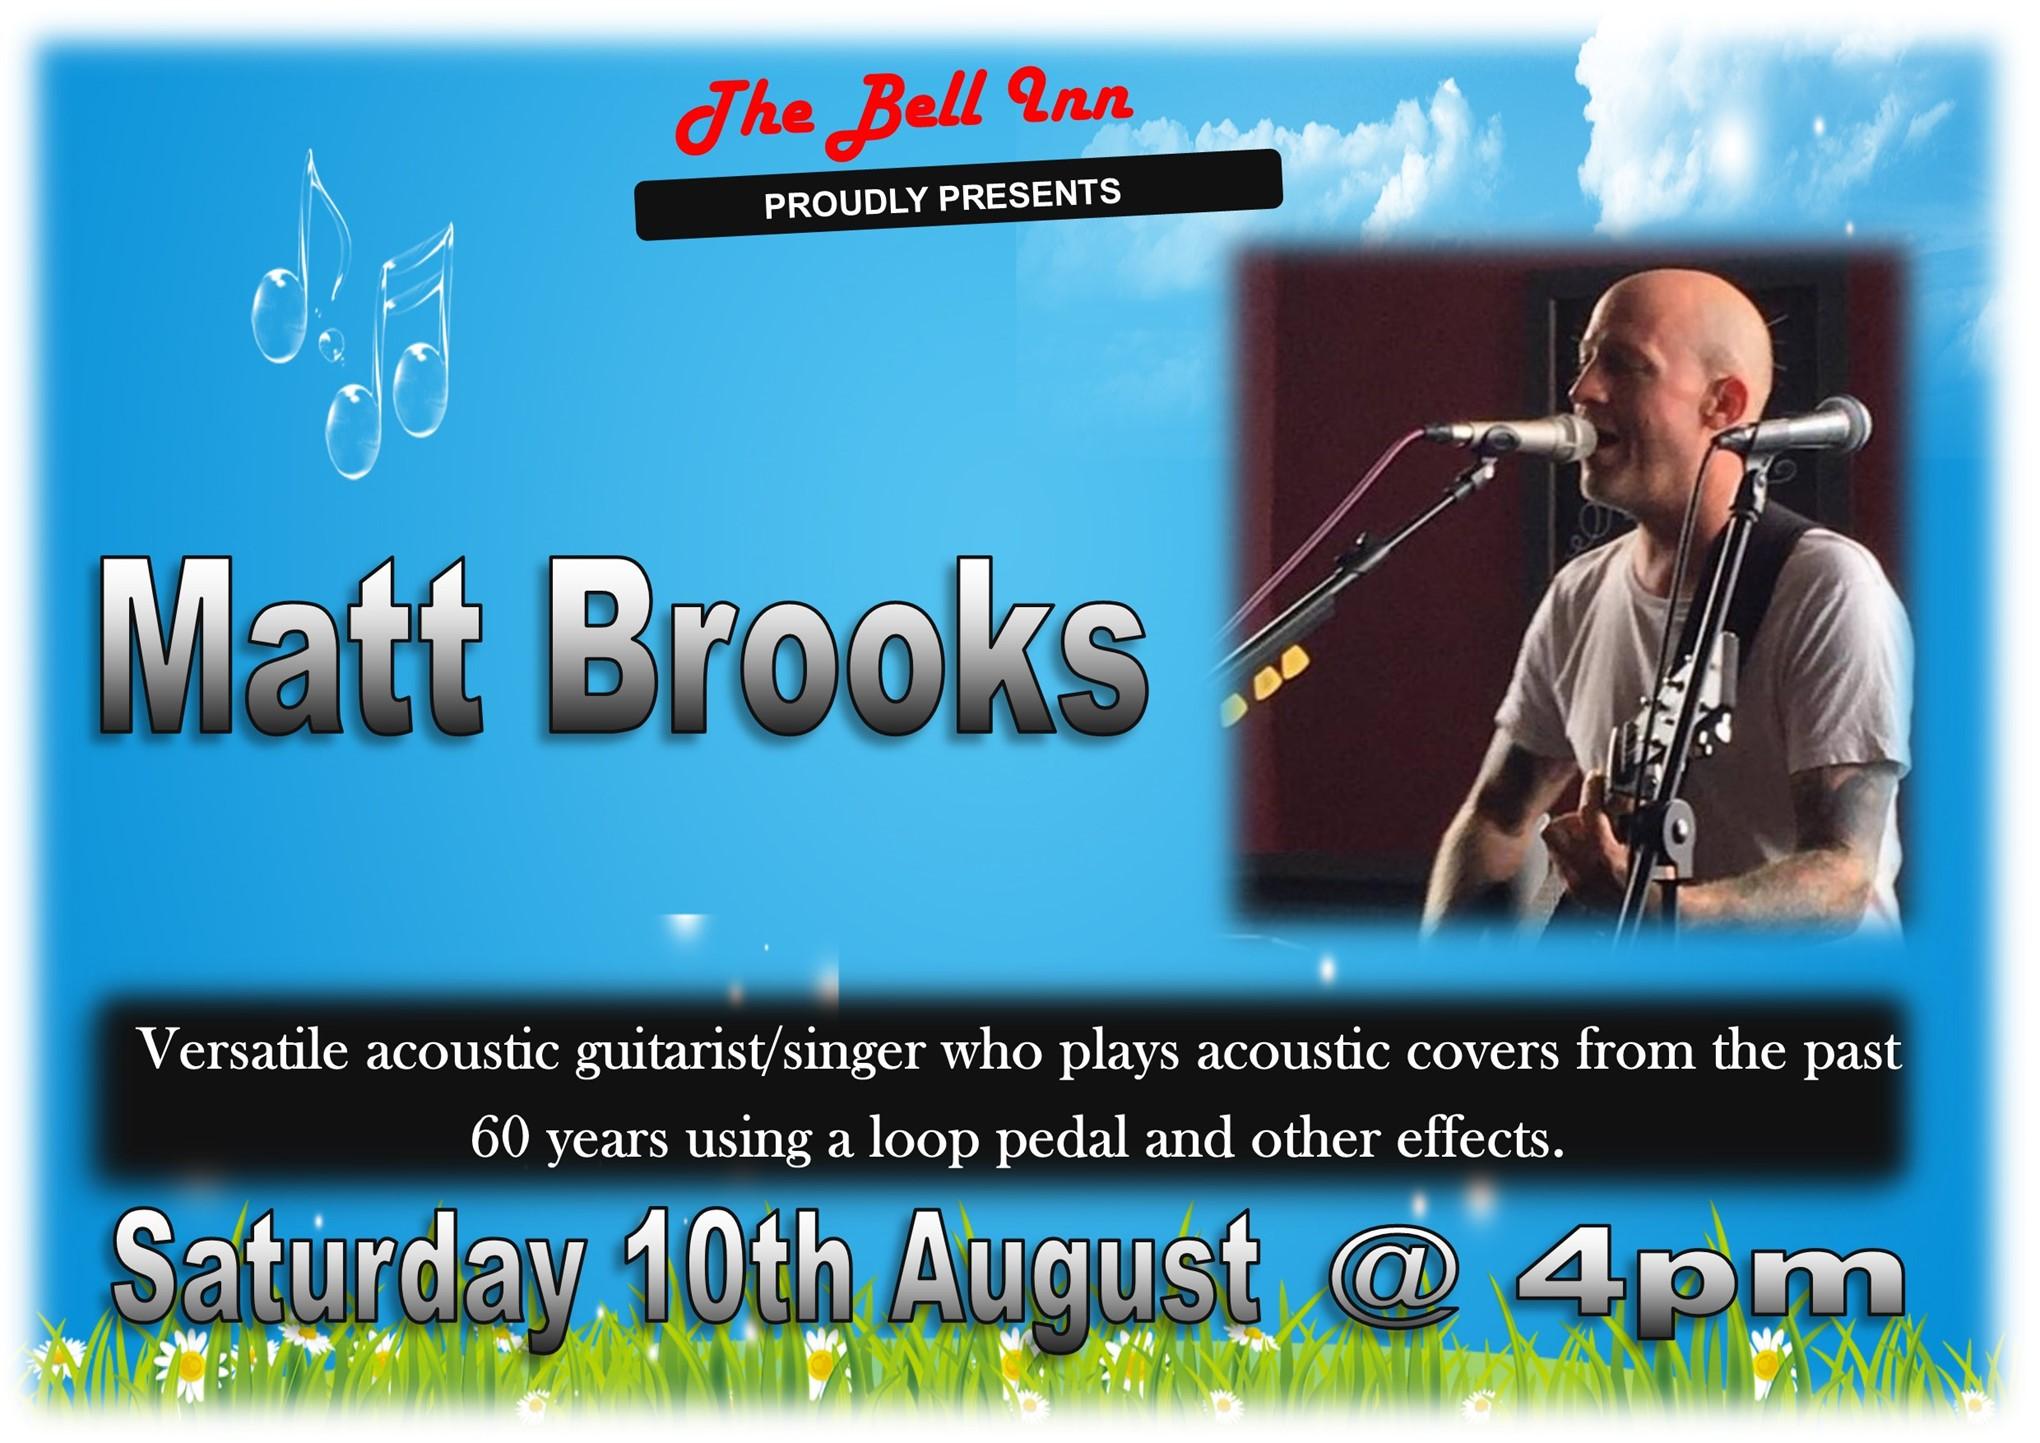 Live music with Matt Brooks